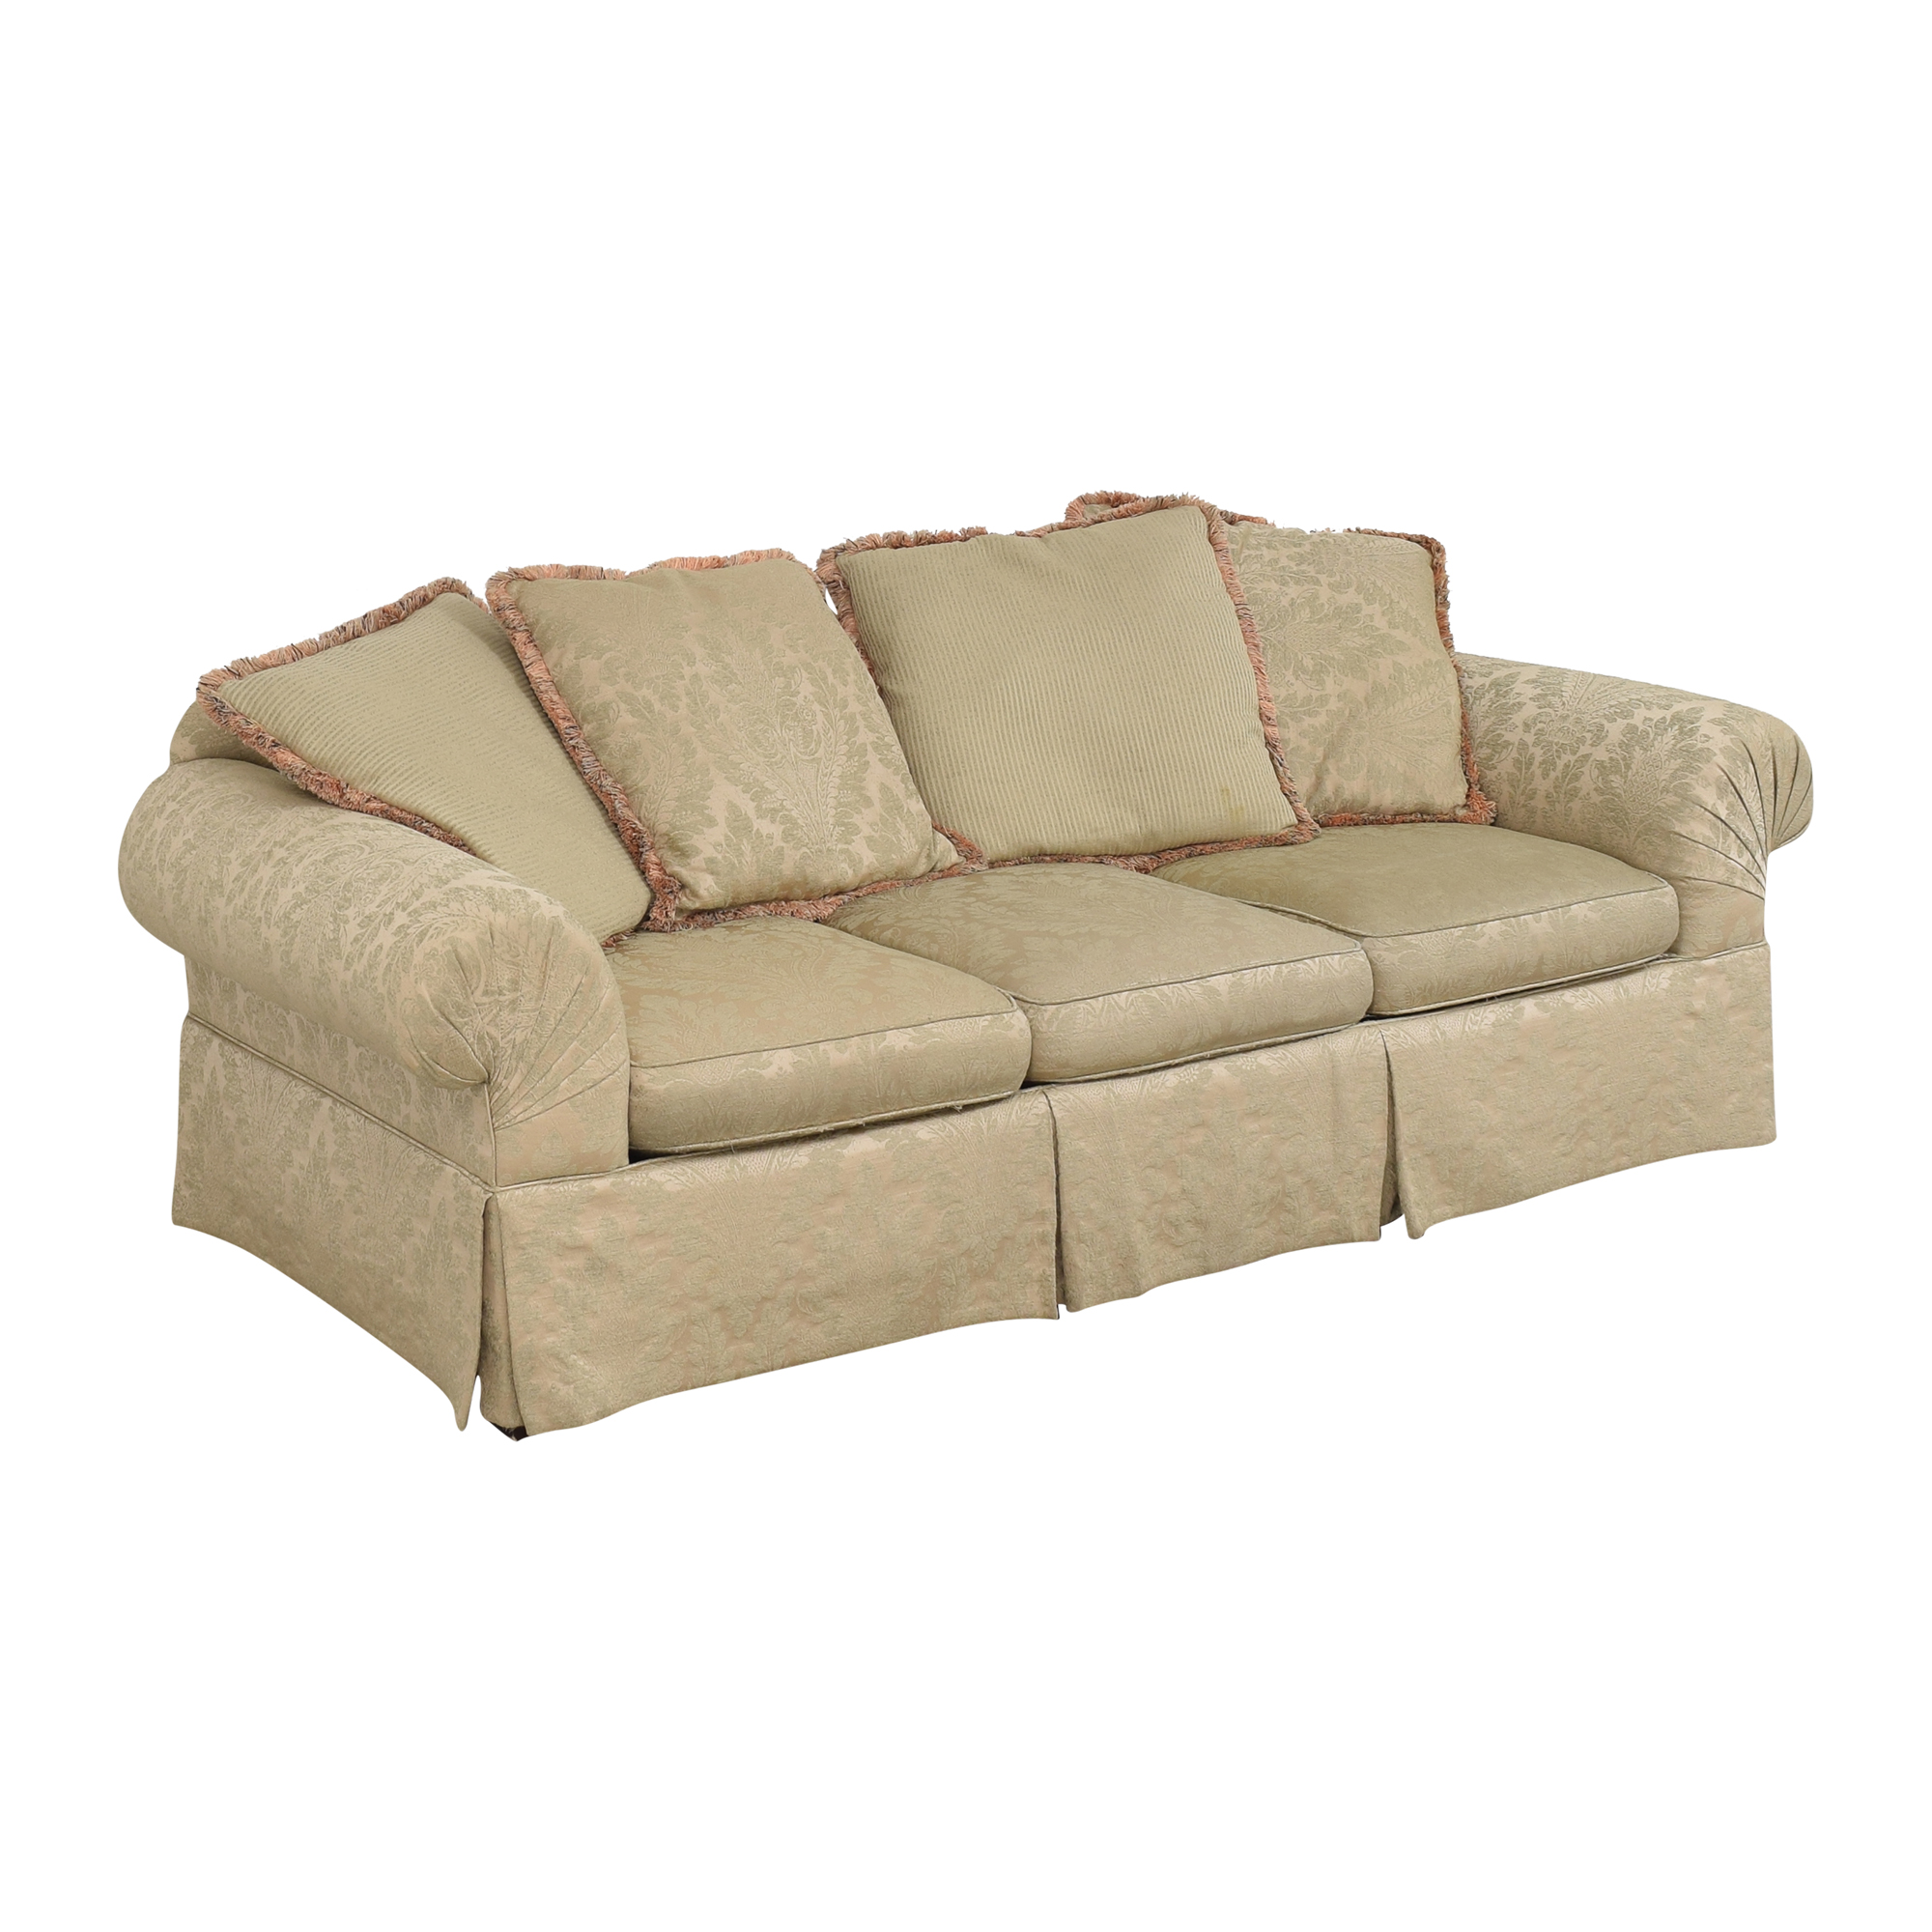 Lexington Furniture Skirted Roll Arm Sofa / Sofas